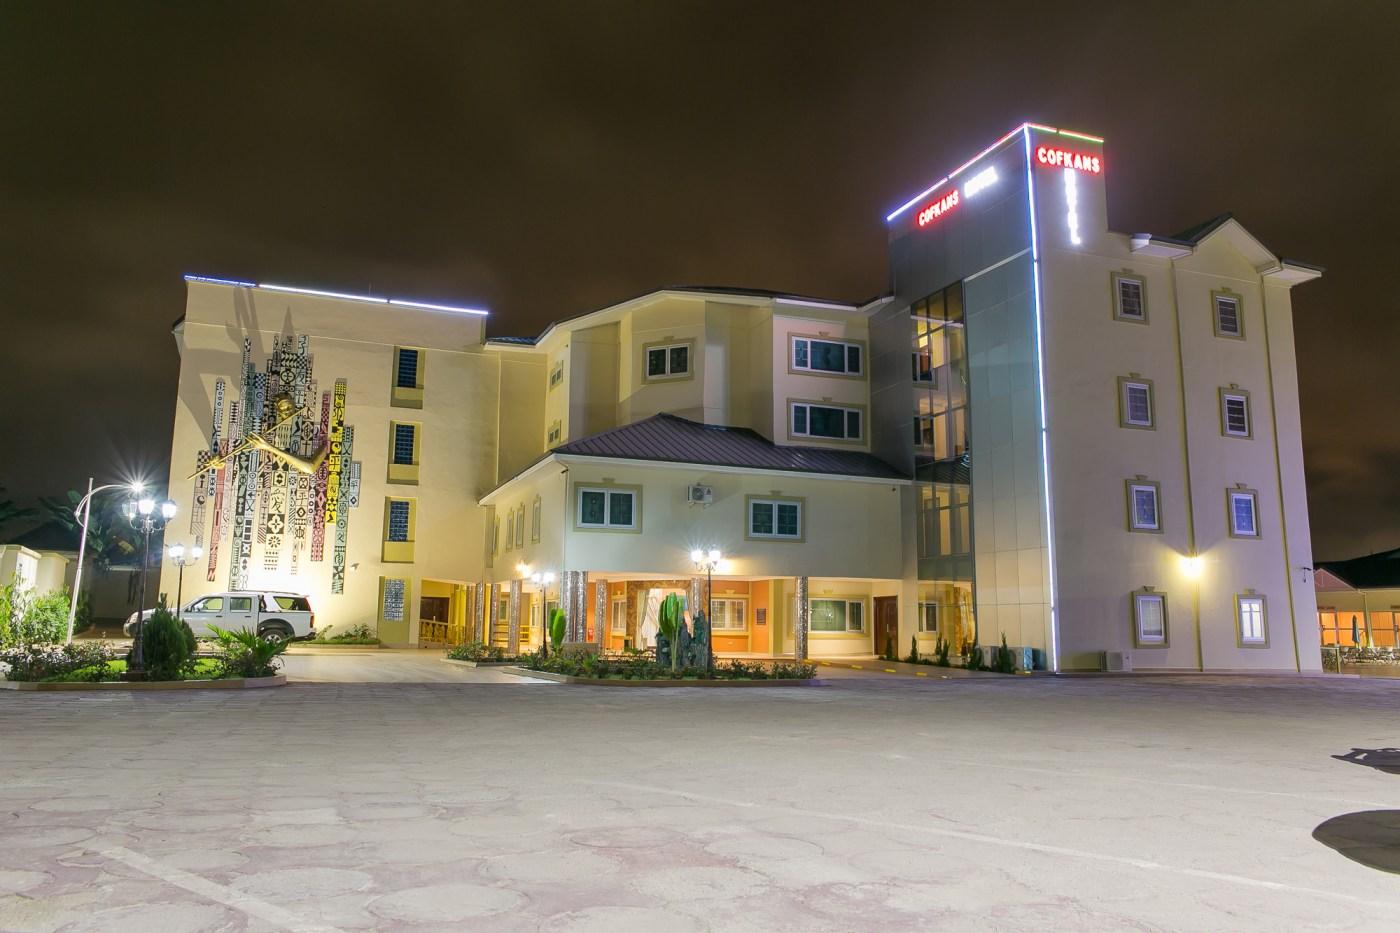 COFKAN HOTEL